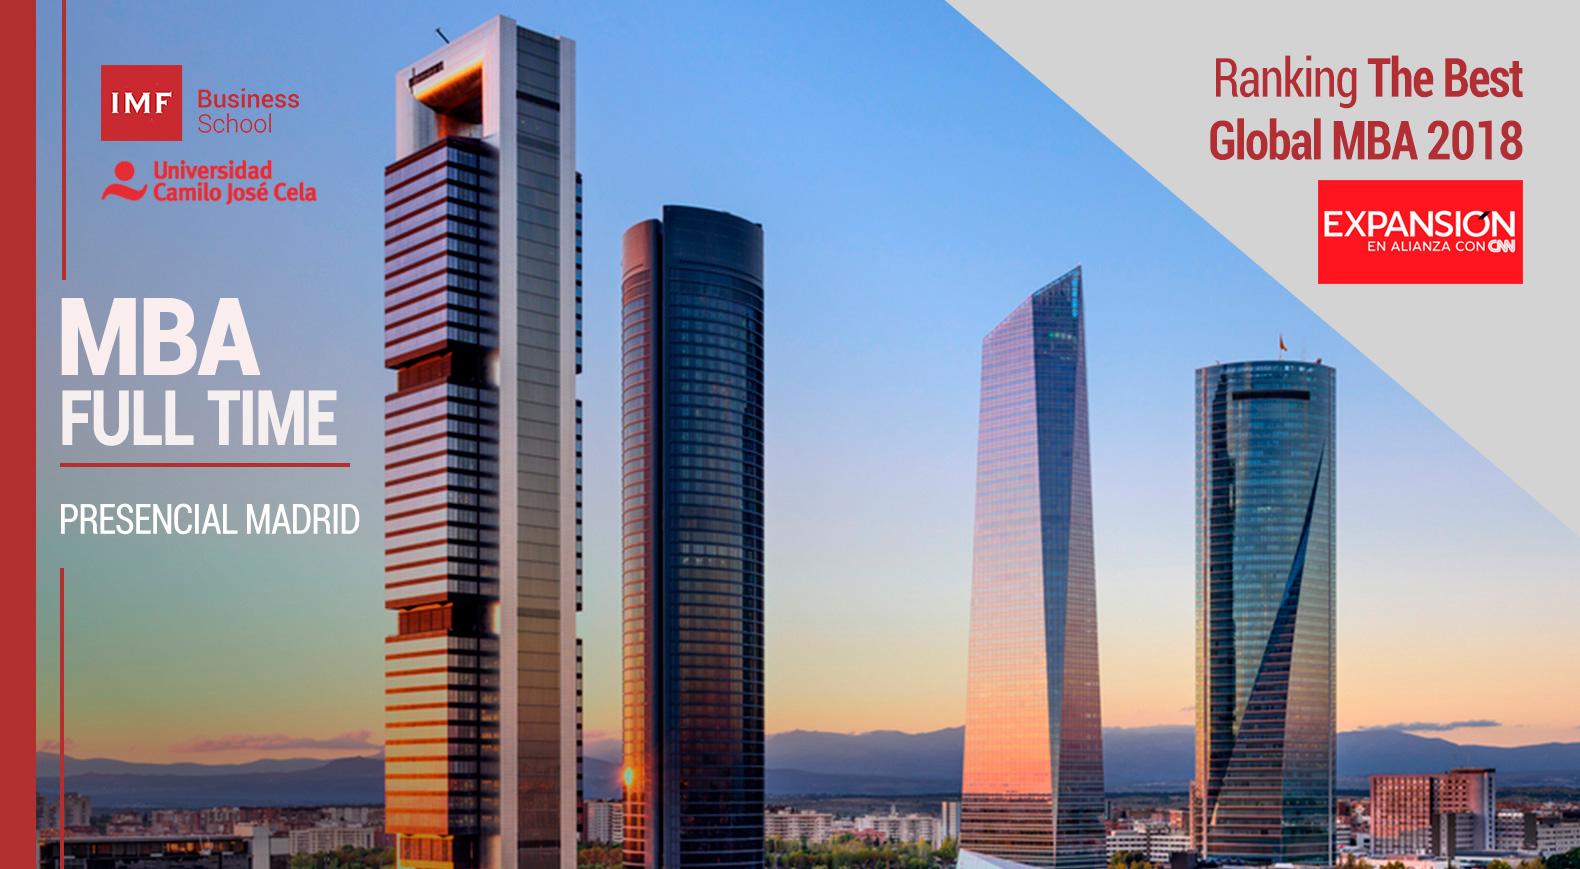 MBA presencial en Madrid IMF